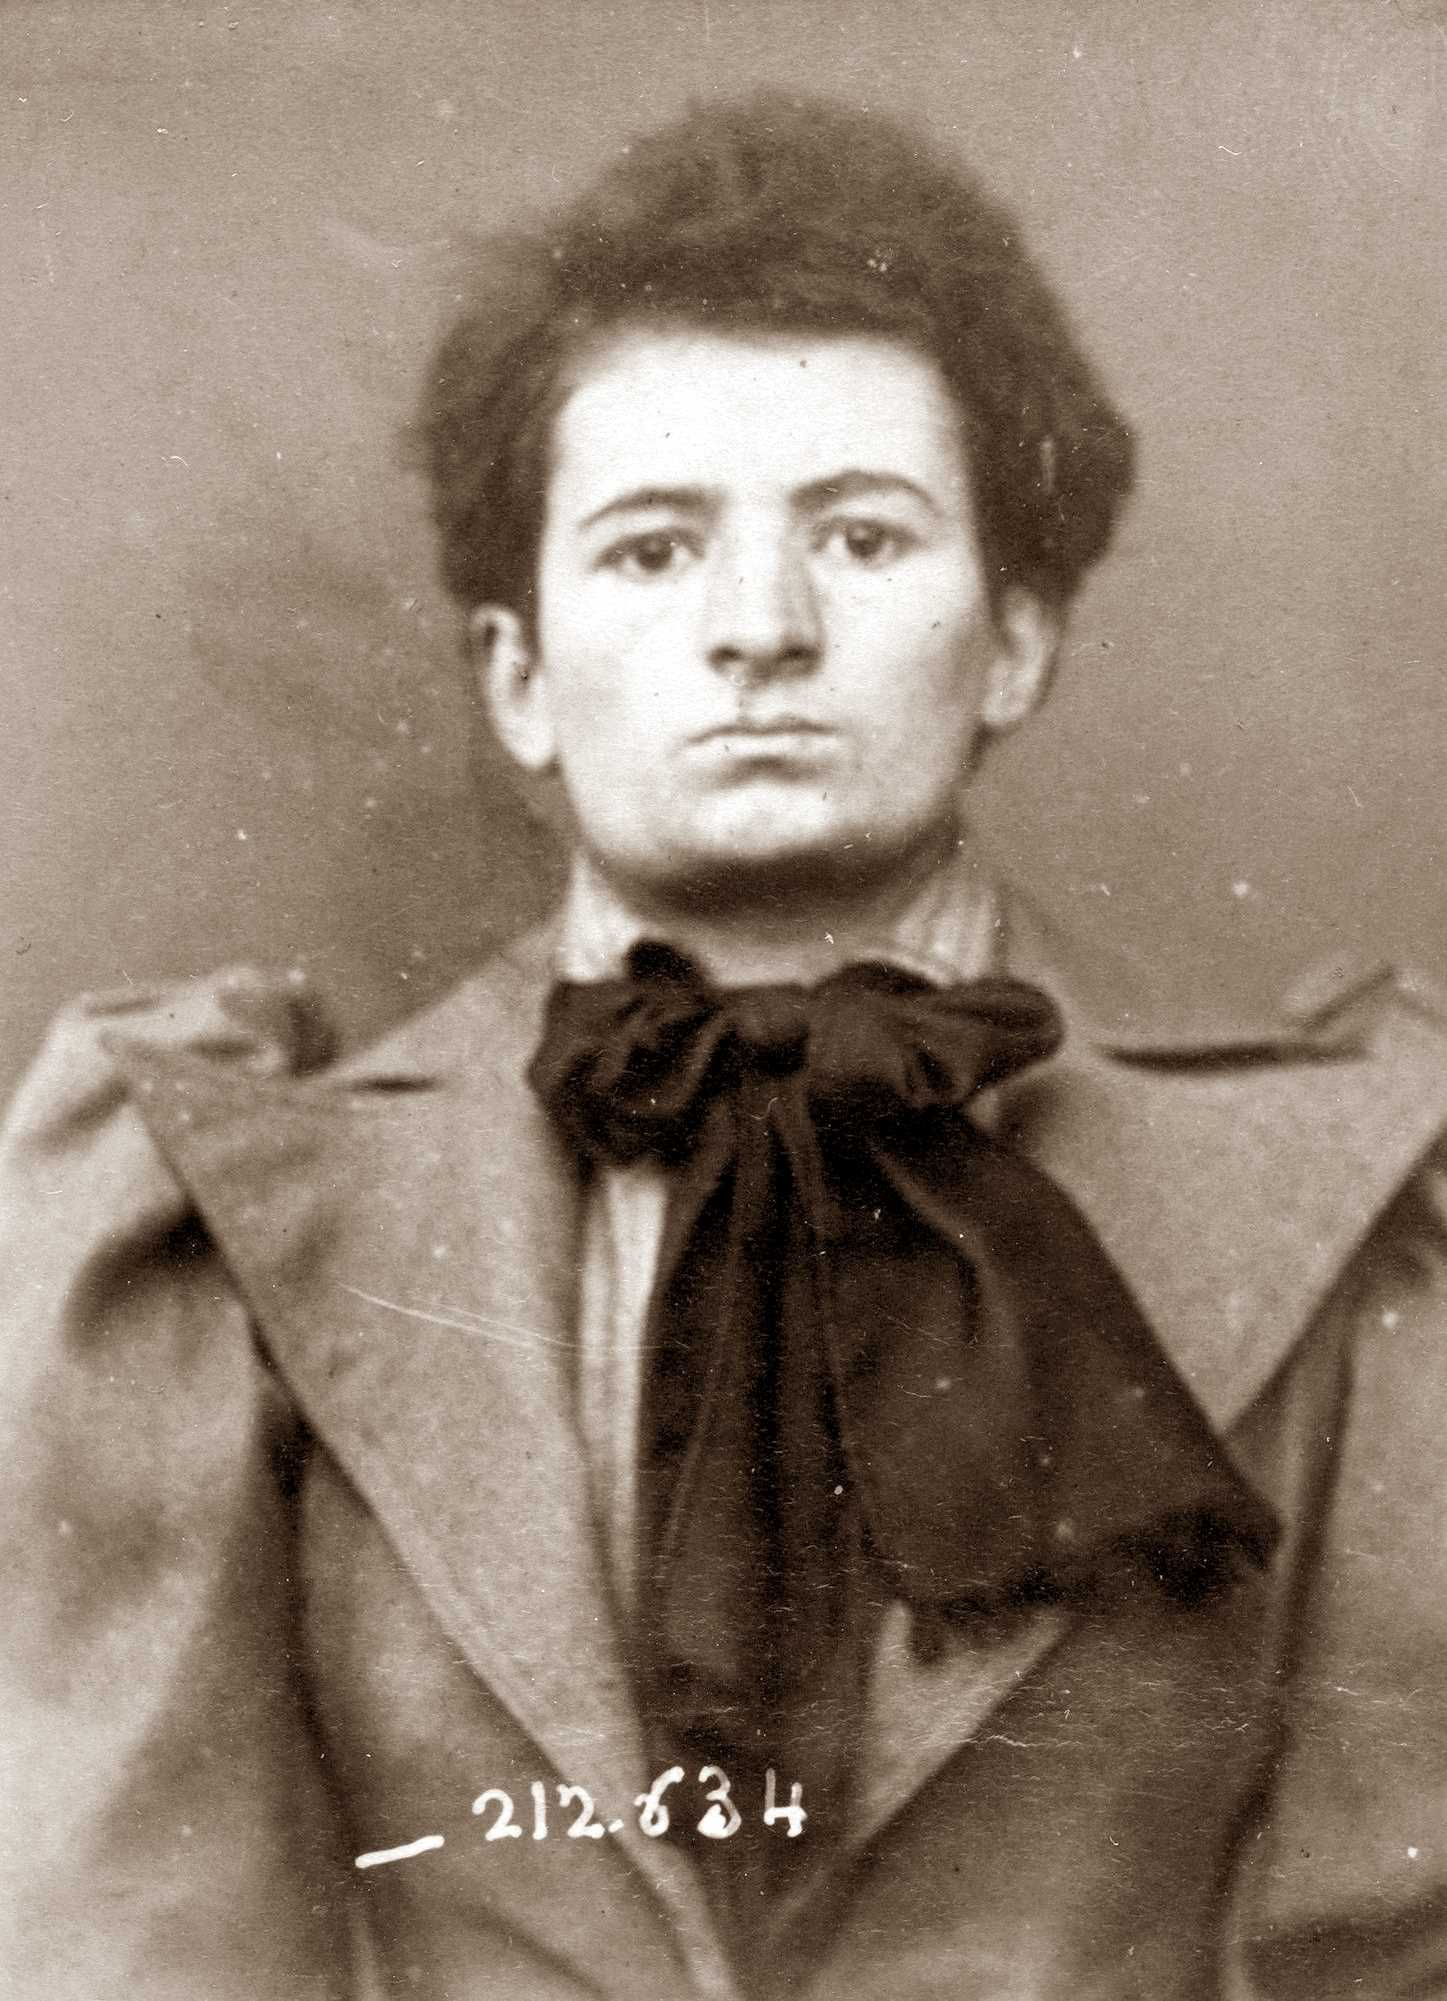 Fotografia policíaca de Jeanne Adnet (8 de gener de 1894)